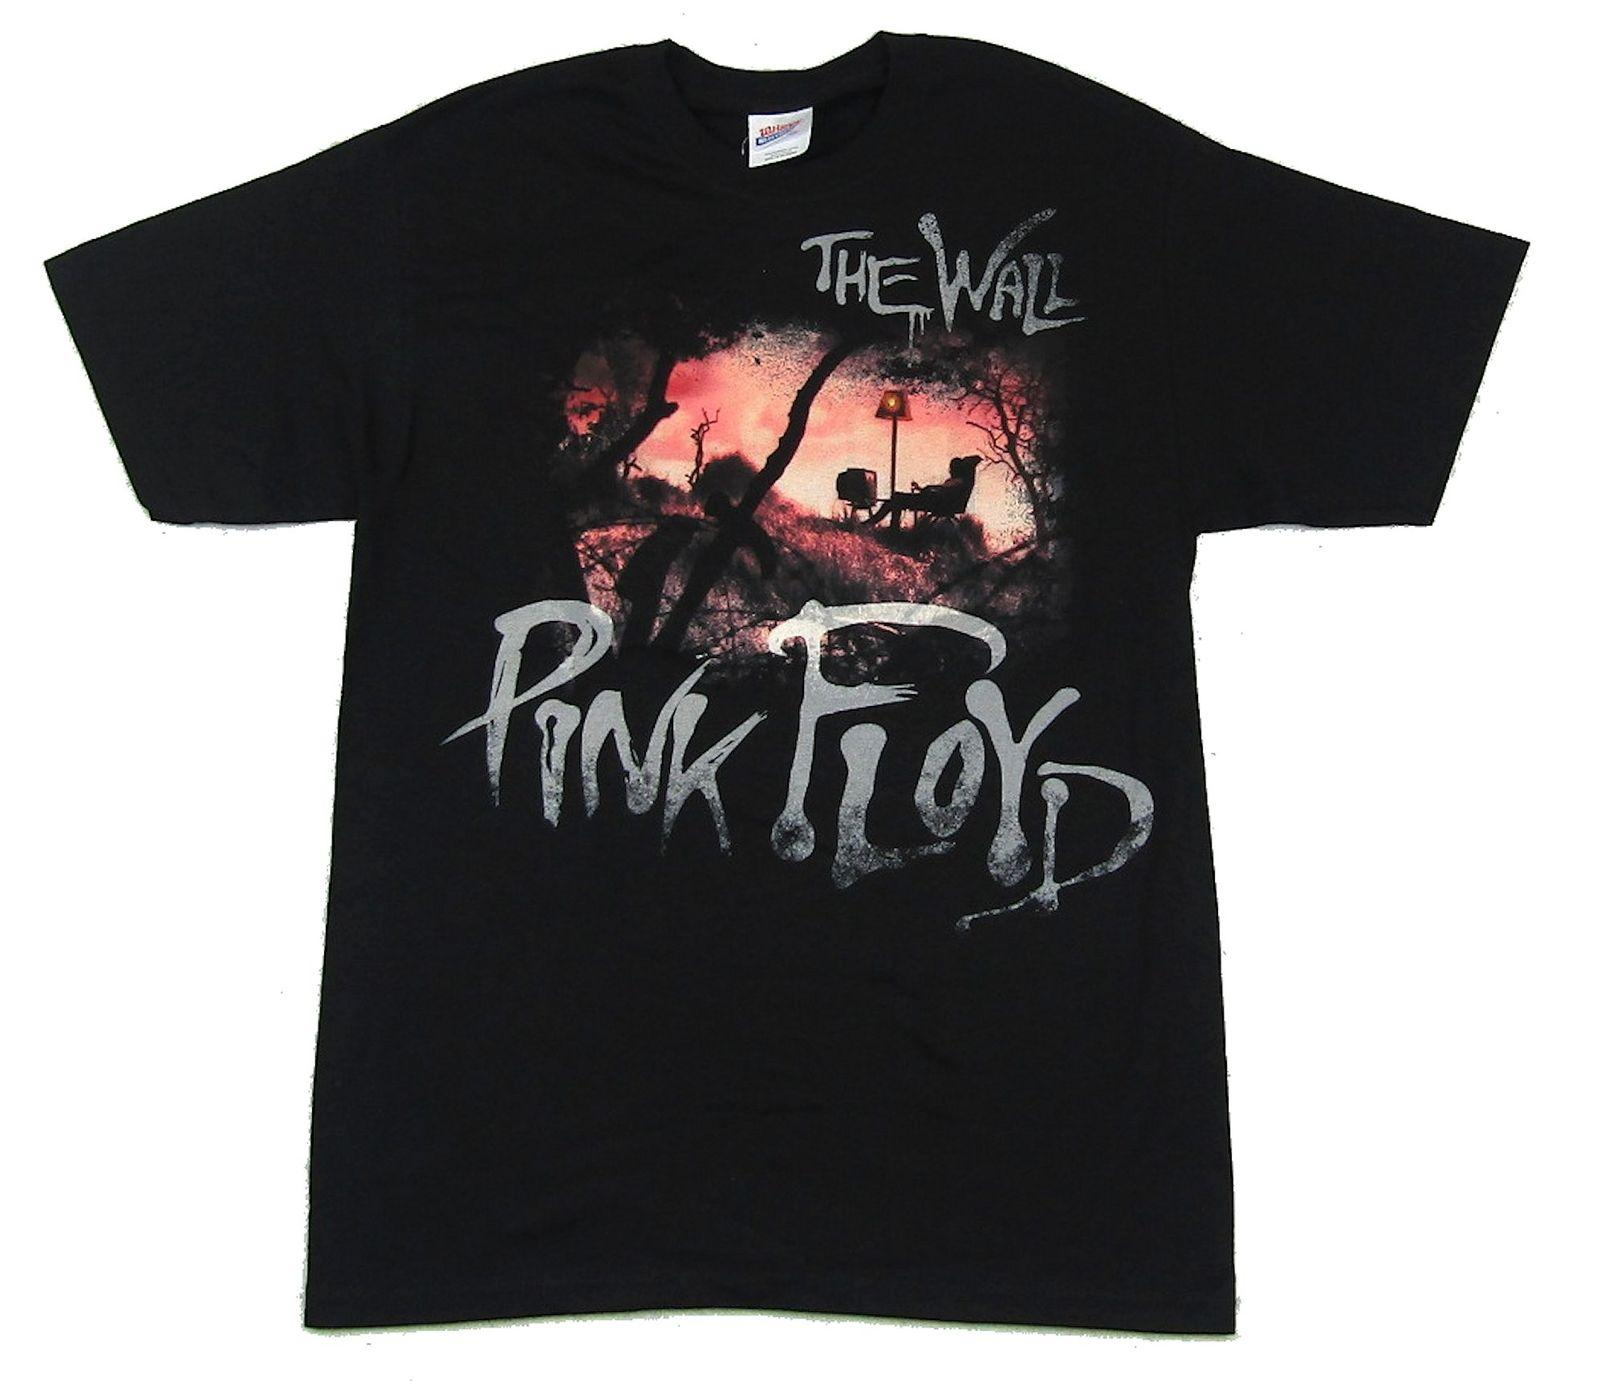 45361ec0a52 Pink Floyd Chair The Wall Black T Shirt New Official Band Merch Movie Tees  T Shirt Shirts Print From Shitan7